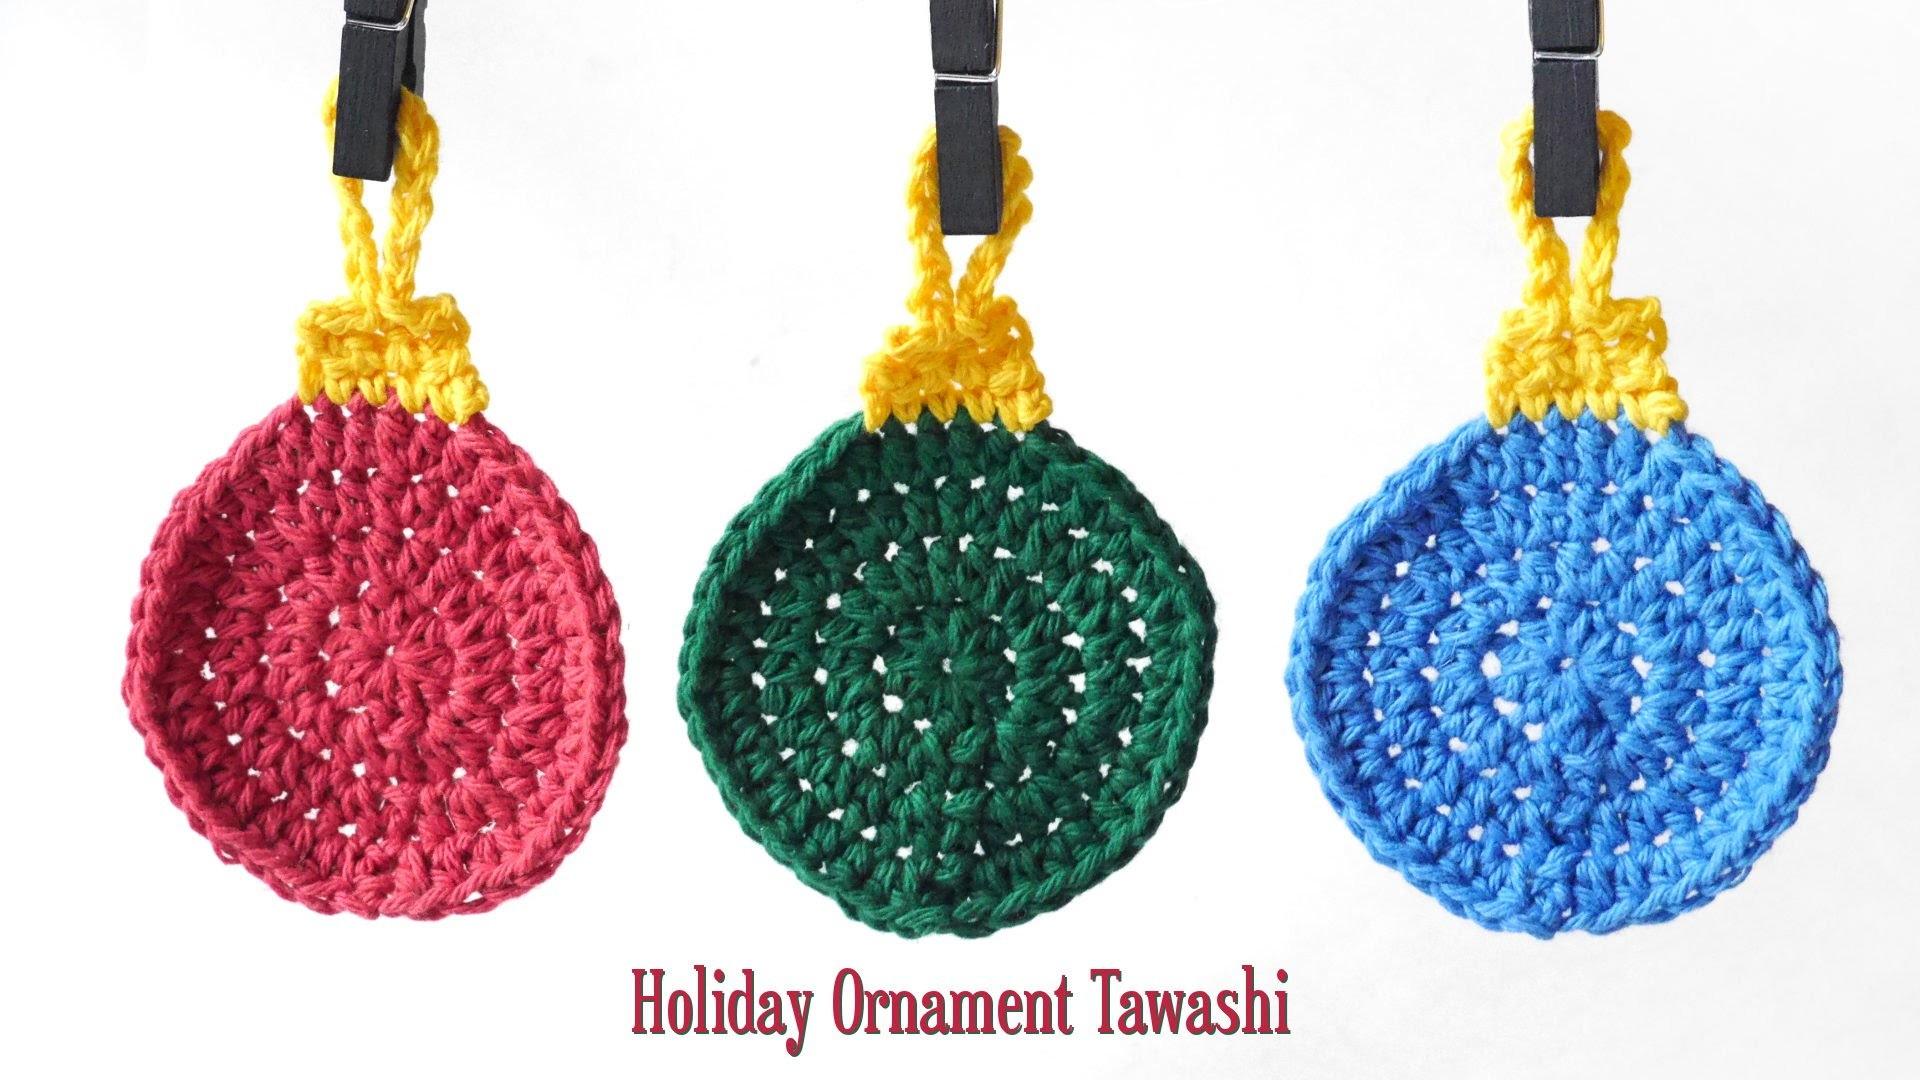 Crochet Holiday Ornament Tawashi